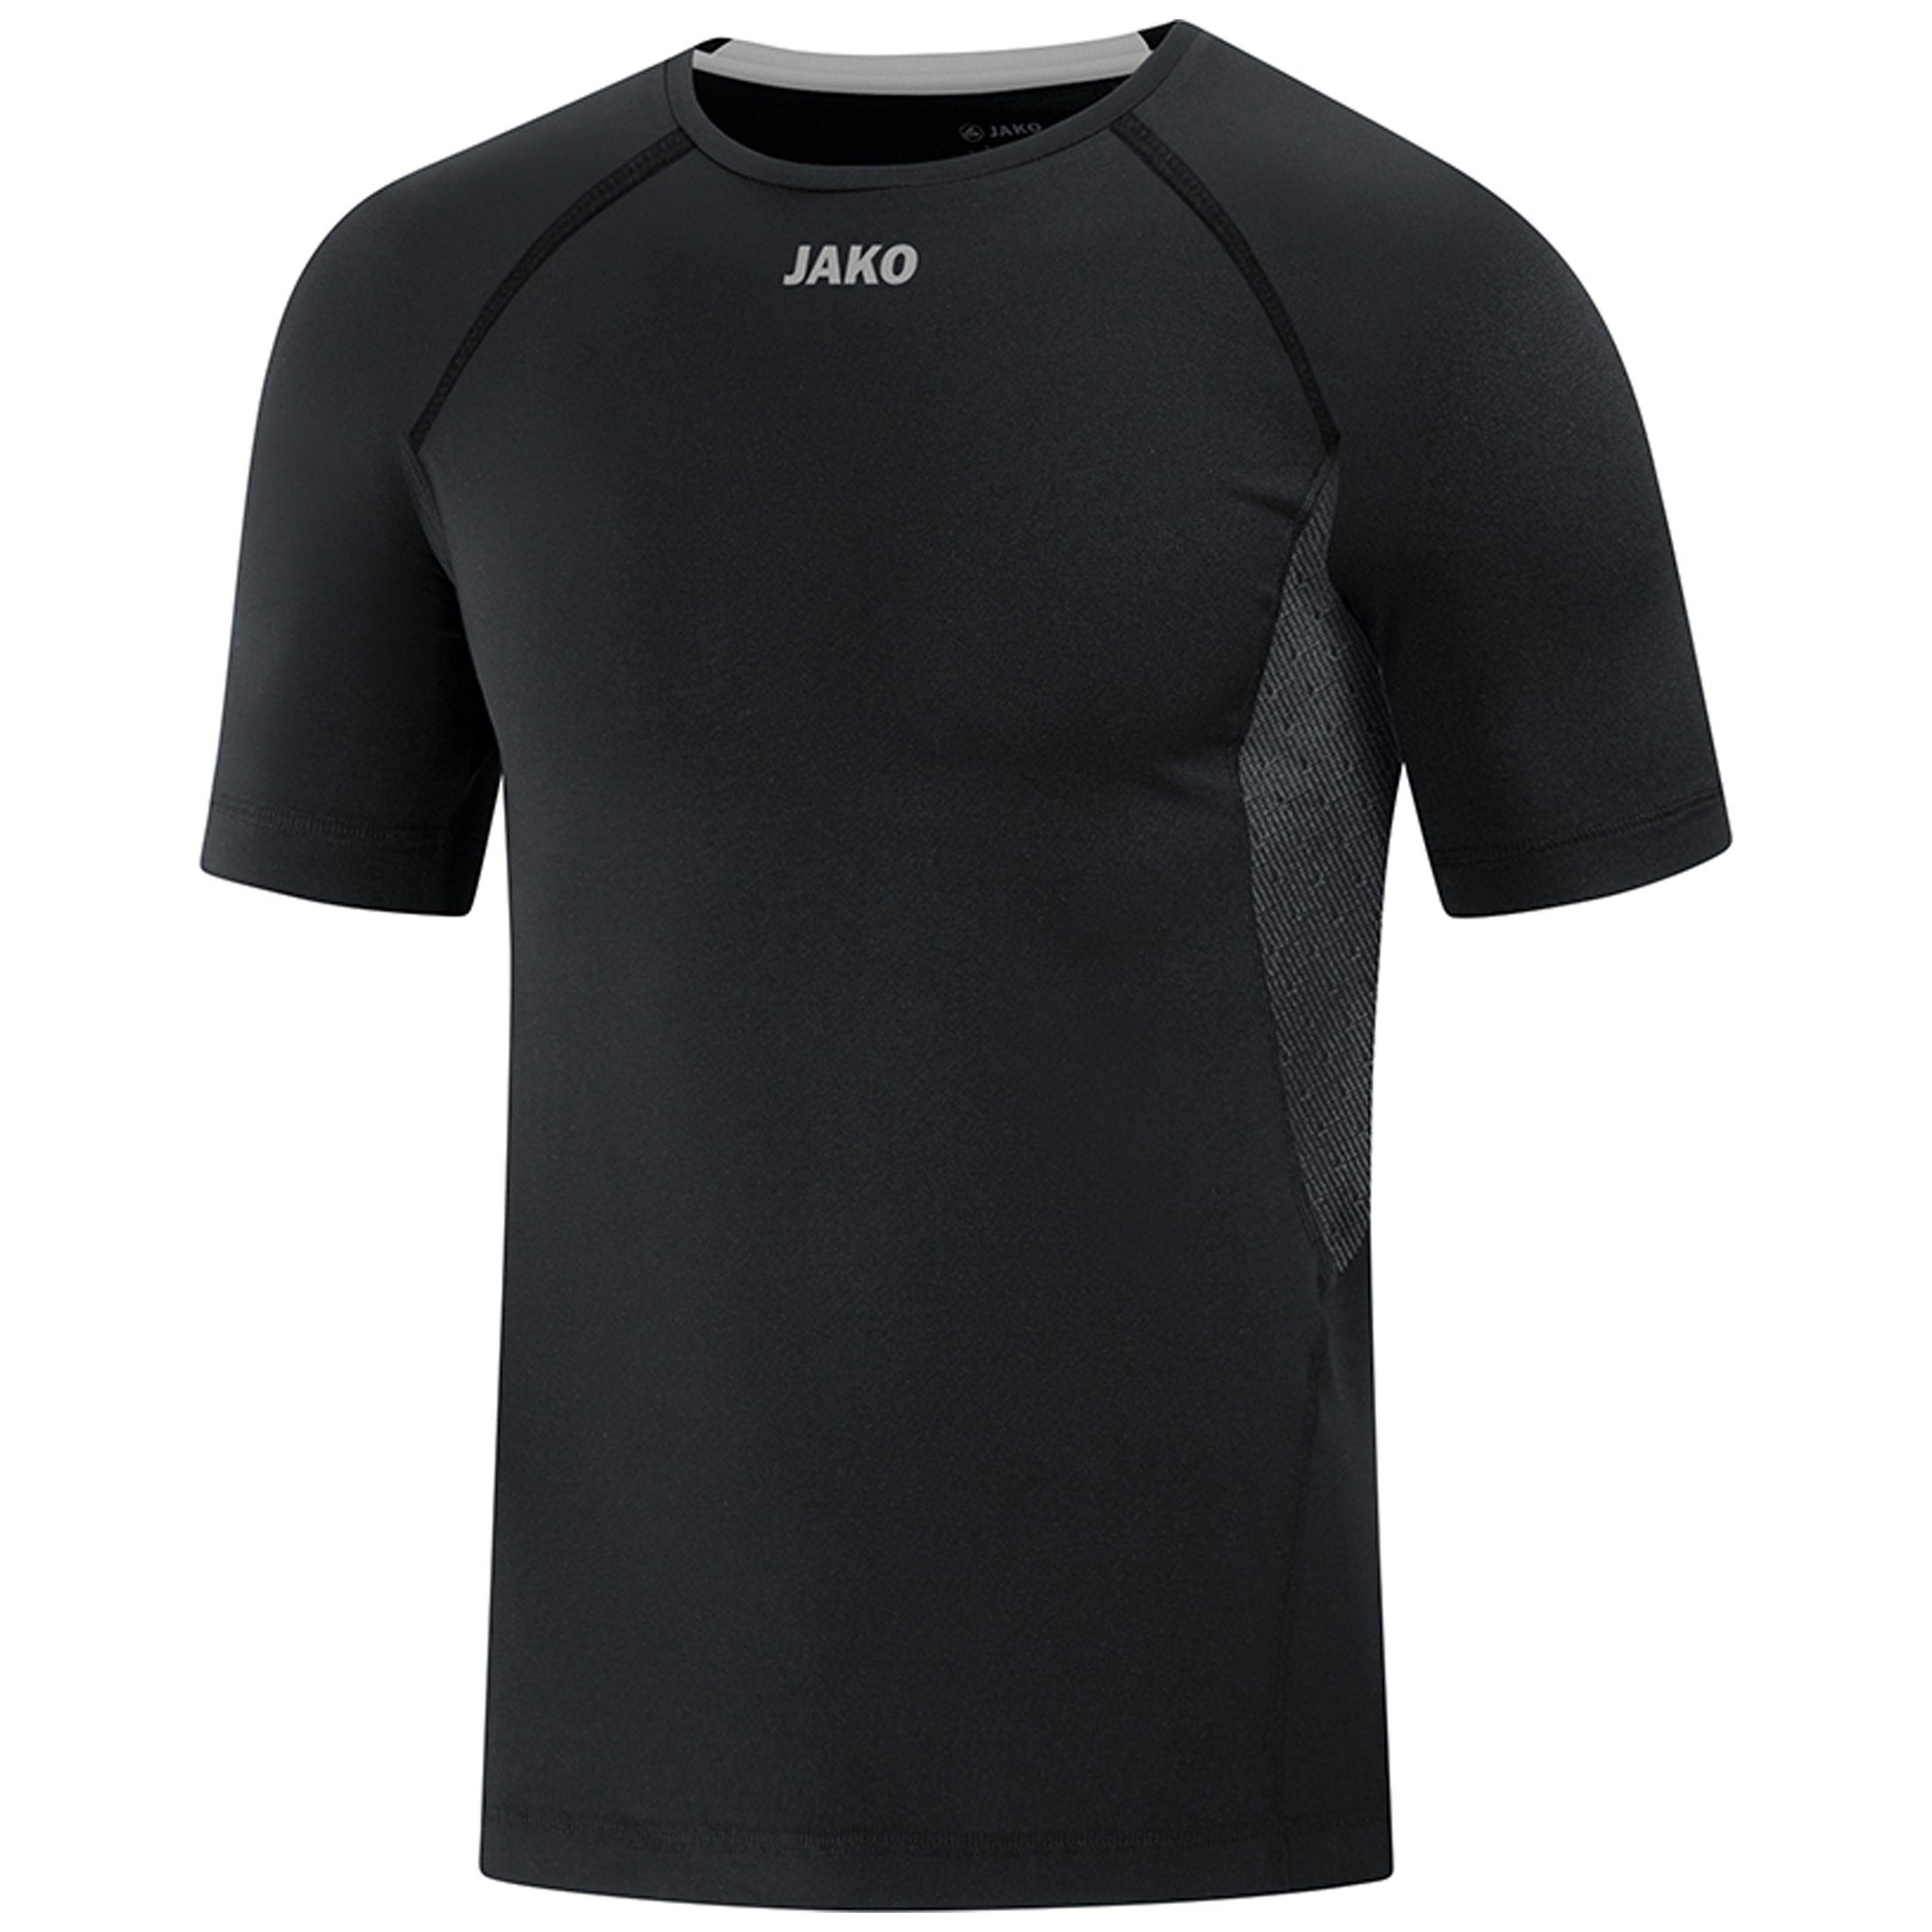 Jako Compression 2.0 T-Shirt Herren